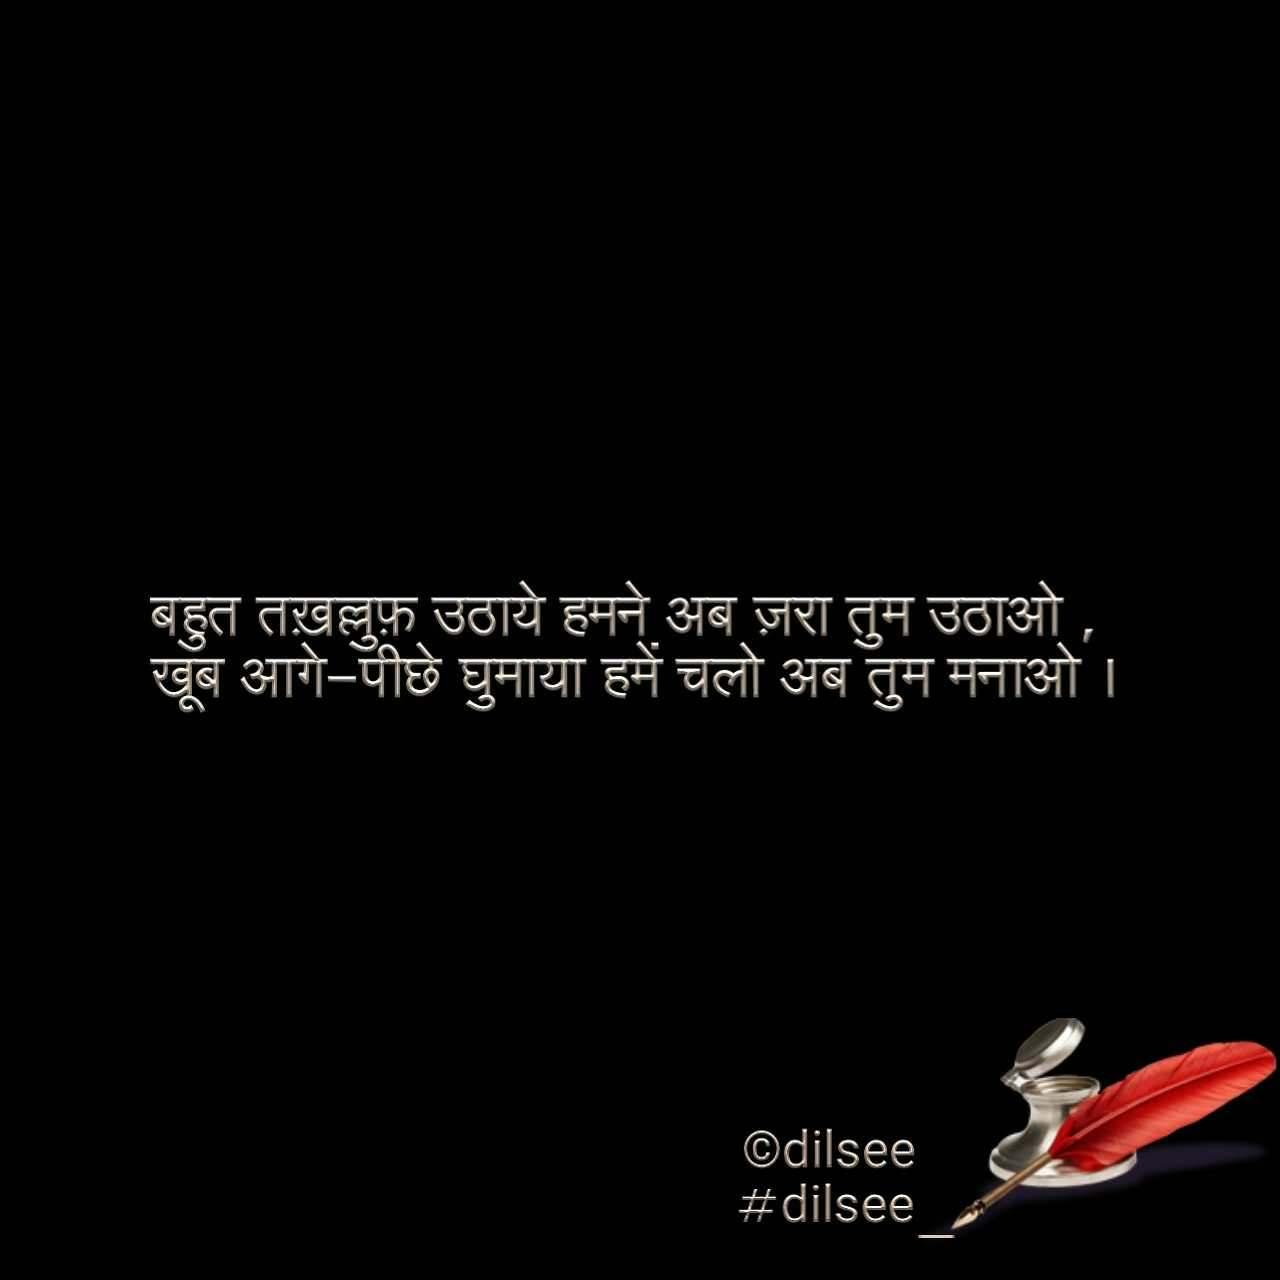 Nojoto 2liner Quote Sher Hindi Urdu Love Breakup Attitude